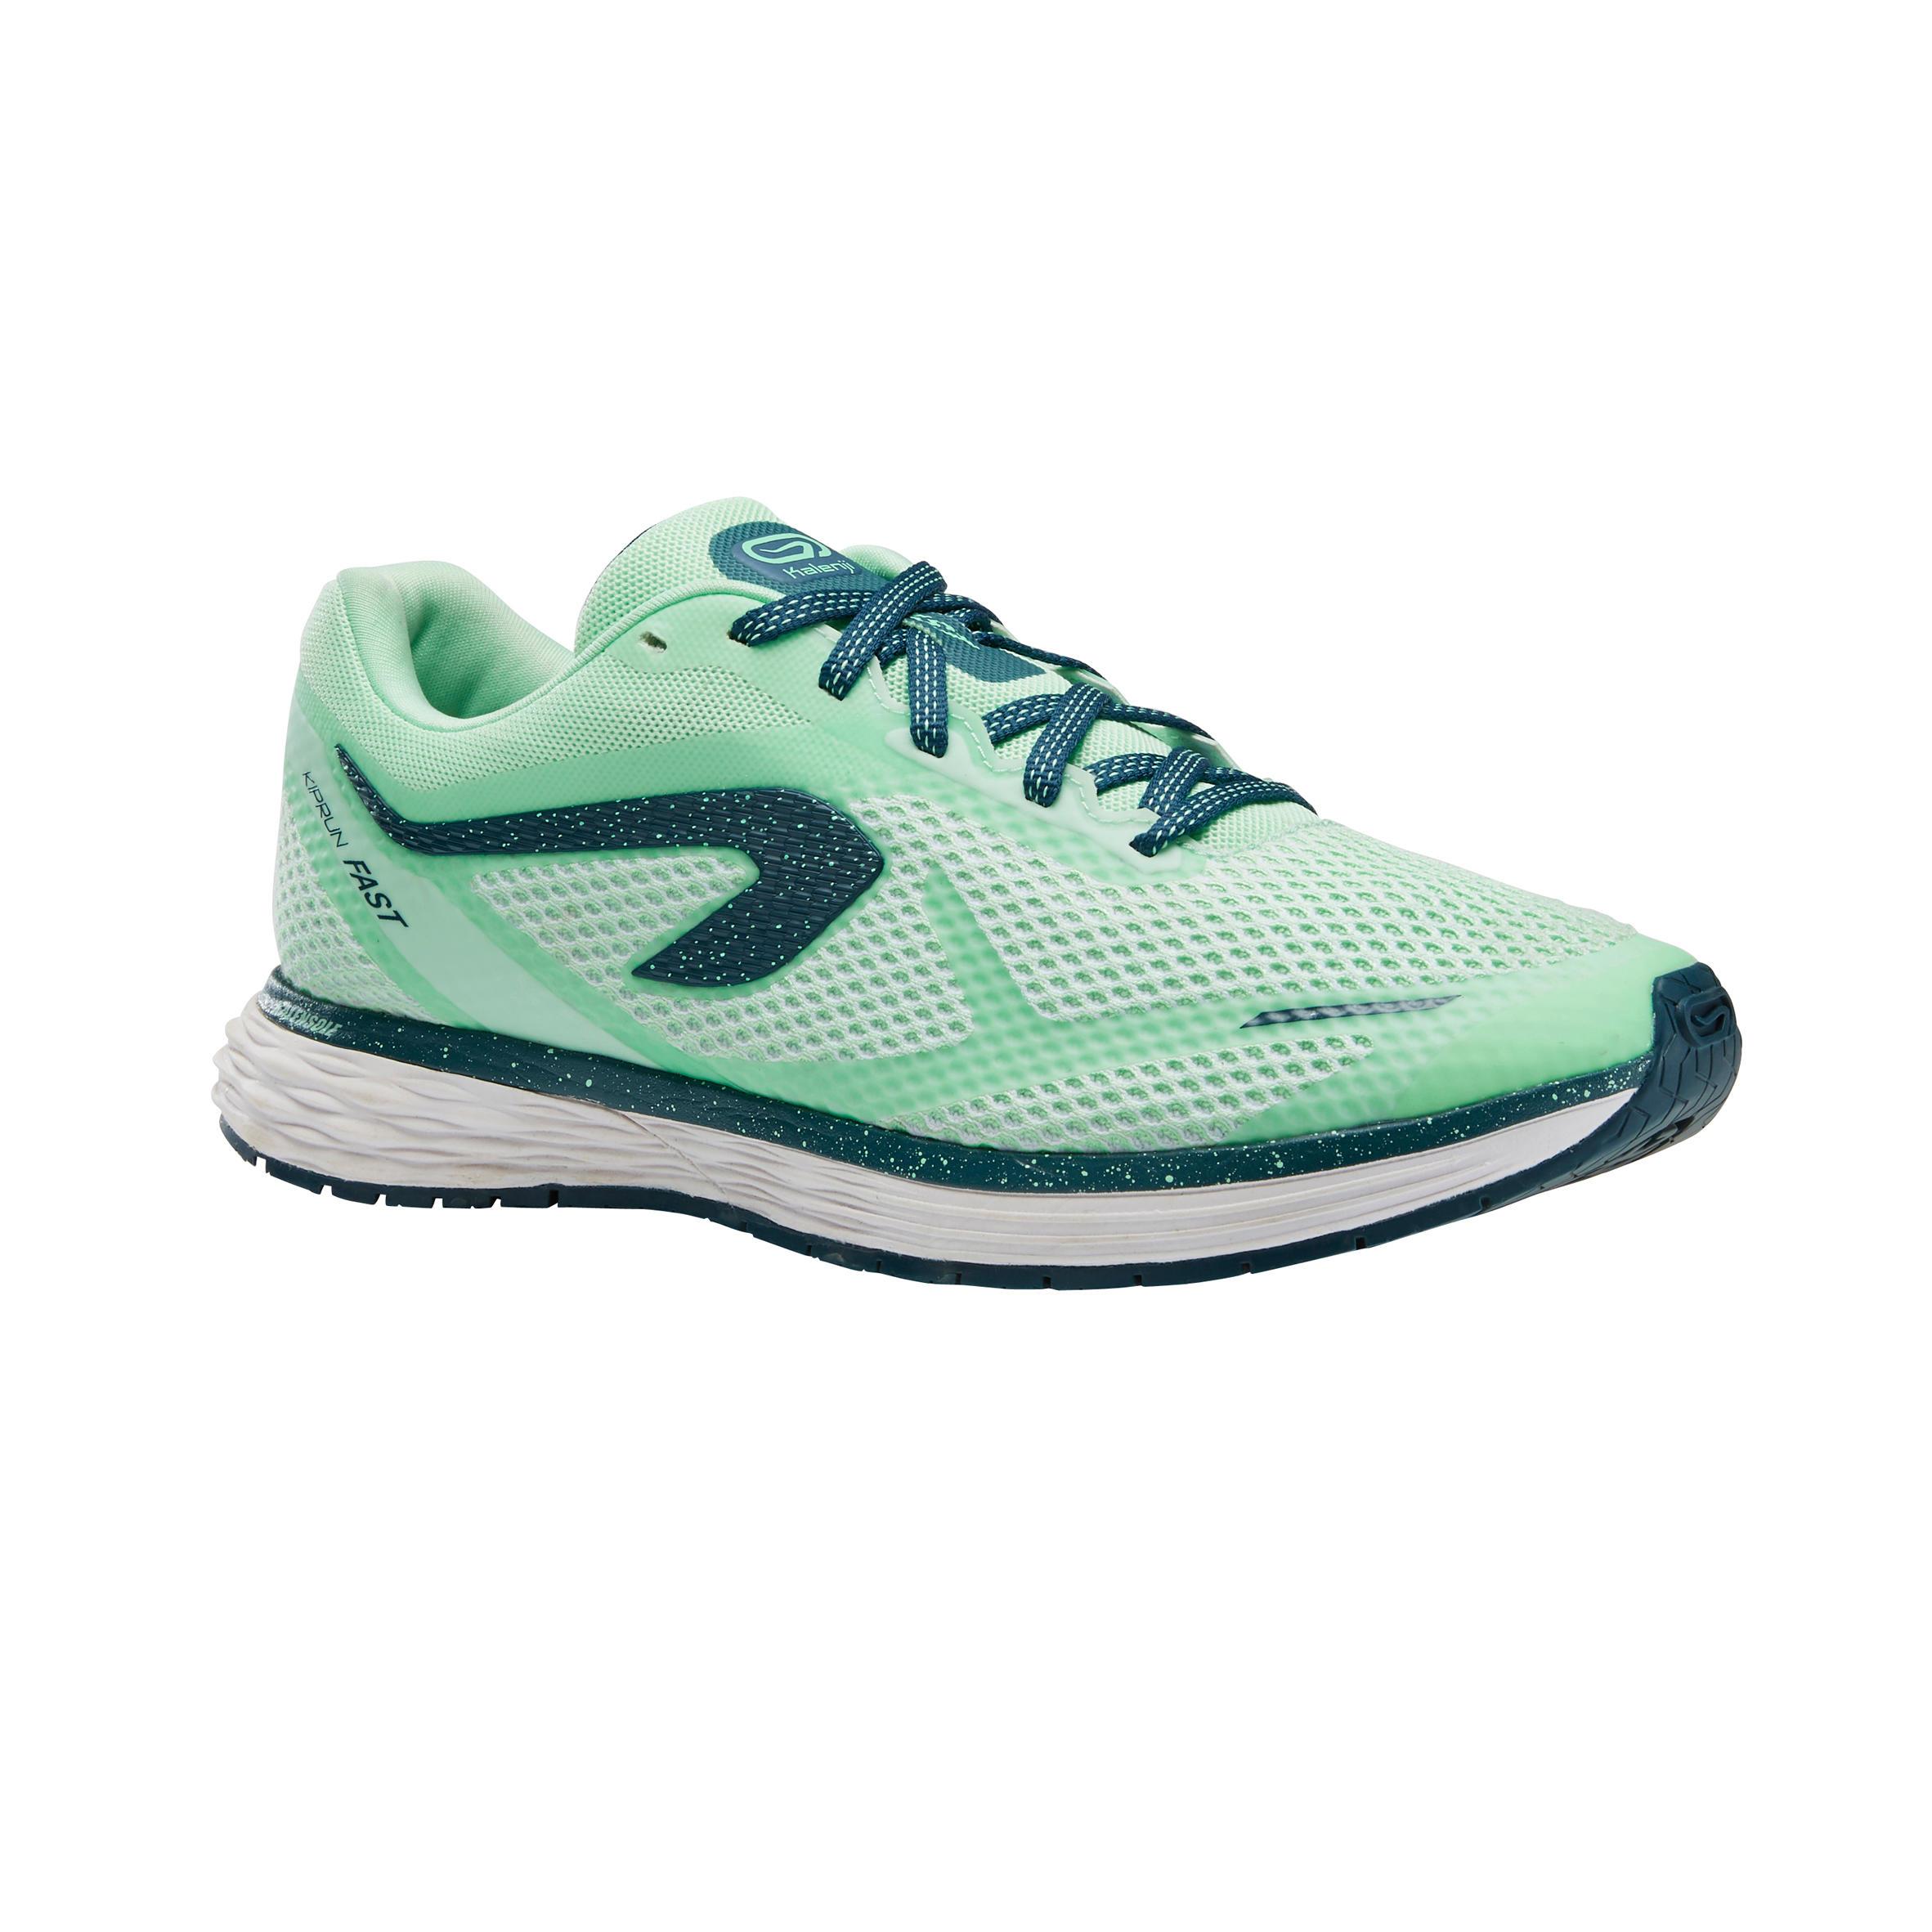 Laufschuhe Kiprun Fast Damen | Schuhe > Sportschuhe > Laufschuhe | Kalenji